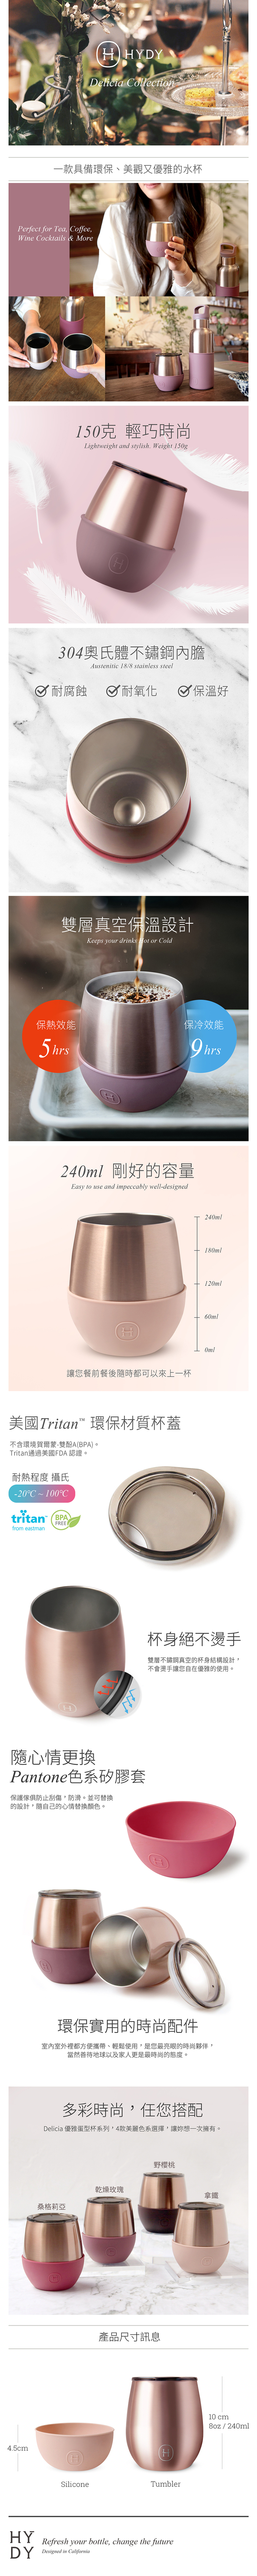 美國HYDY時尚蛋型杯   CinCin& Delicia-蜜粉金杯瓶組合